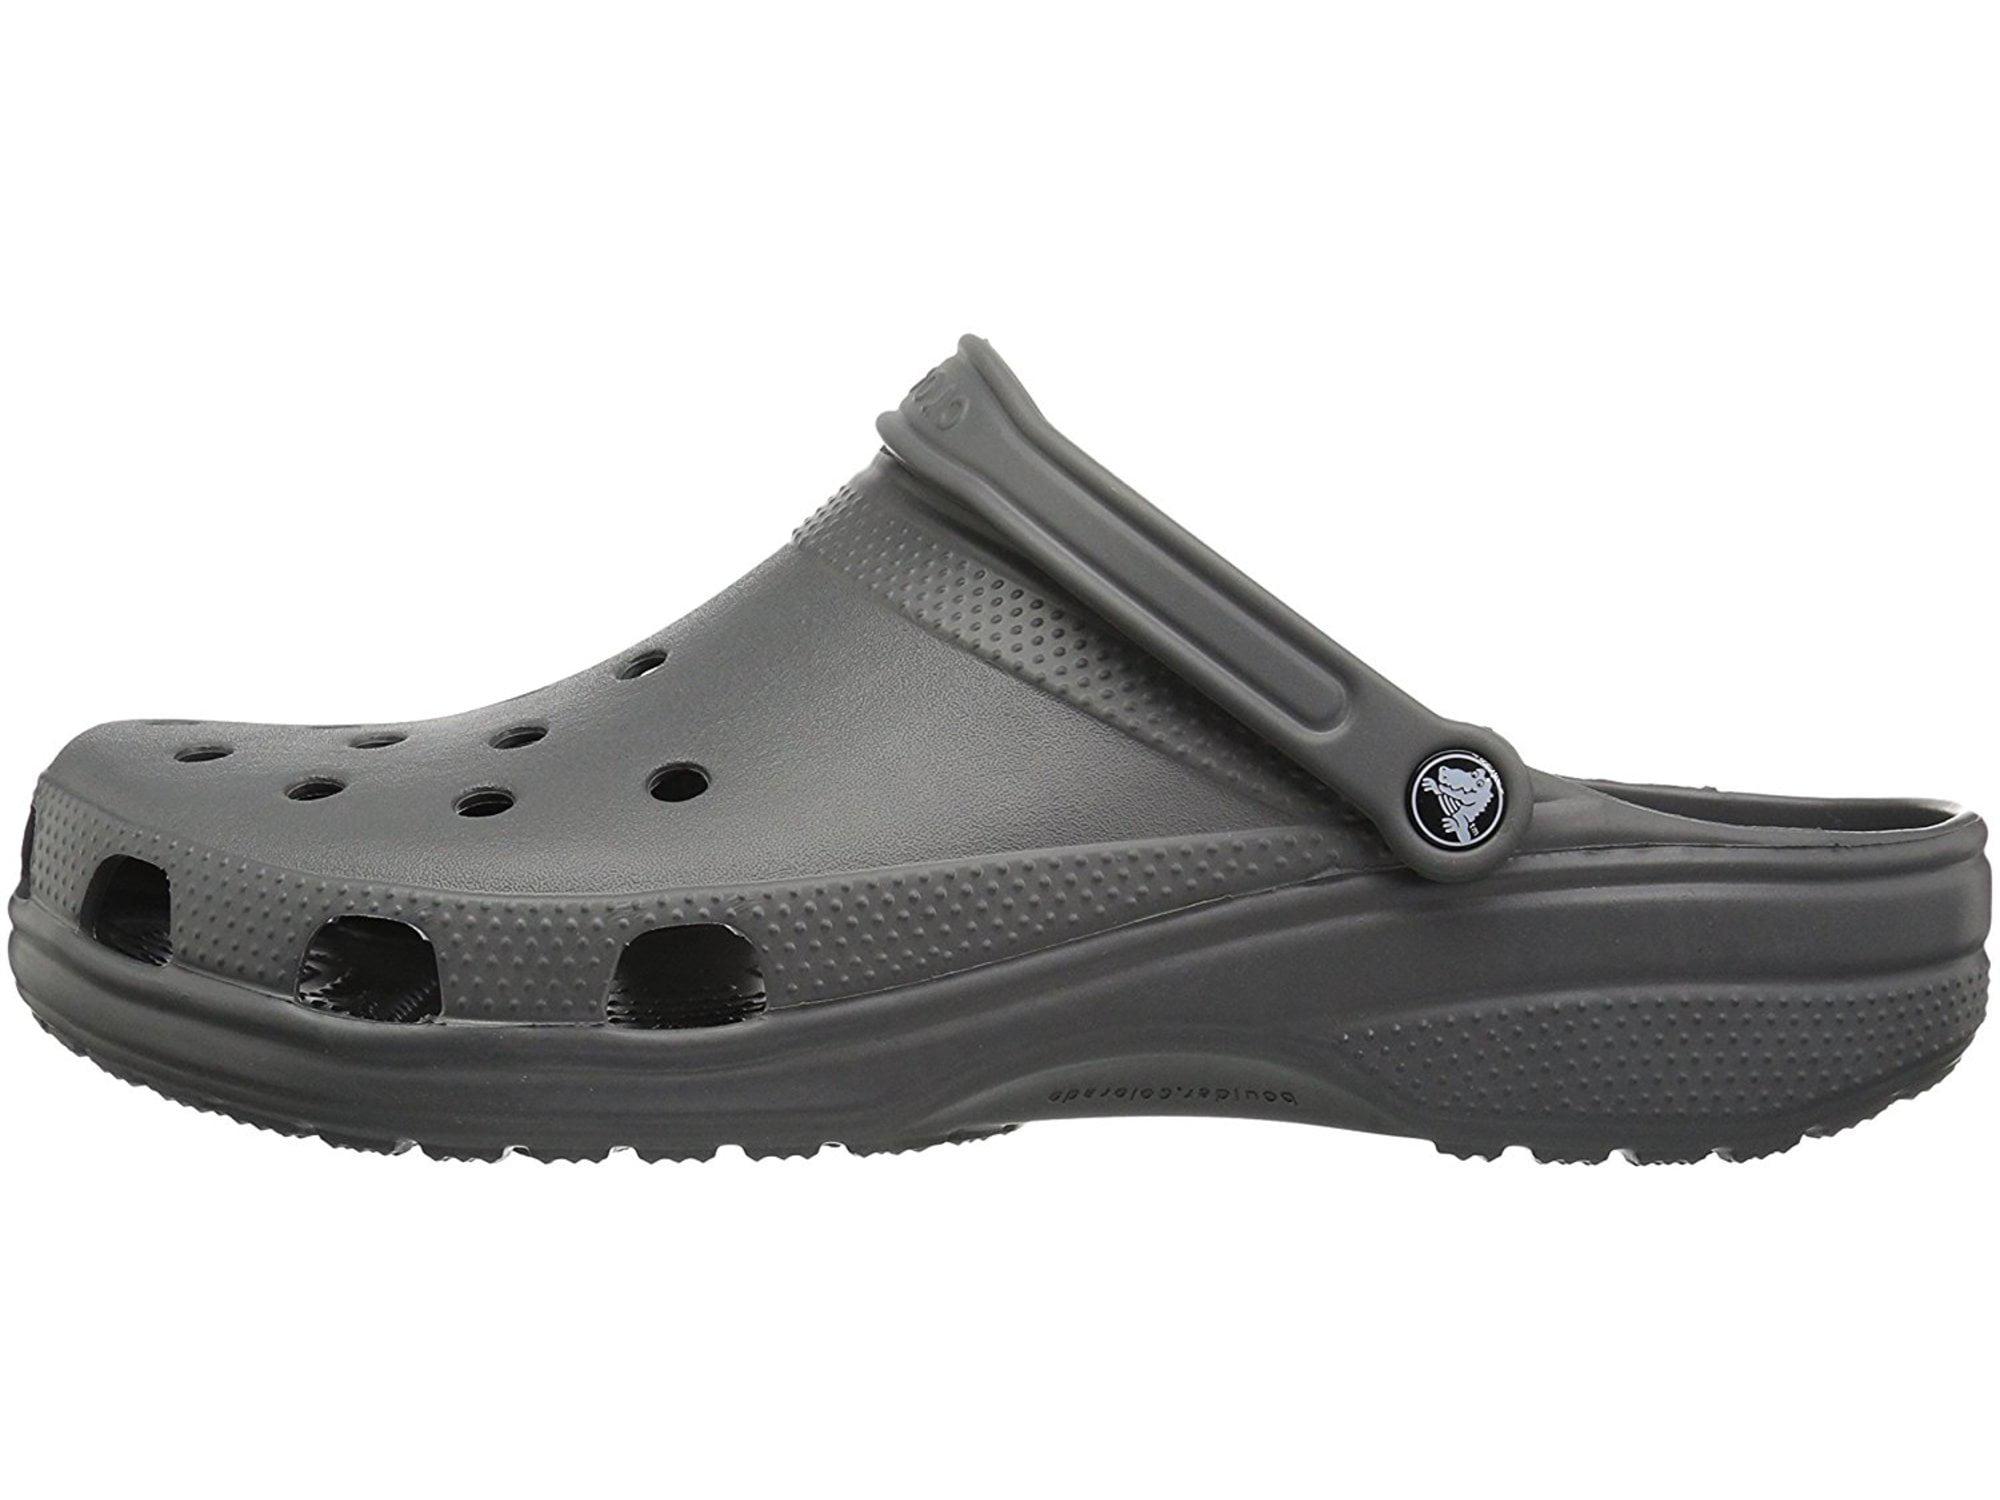 3df7ed9d365b5a Crocs Mens Alligator Slip On Casual Clogs